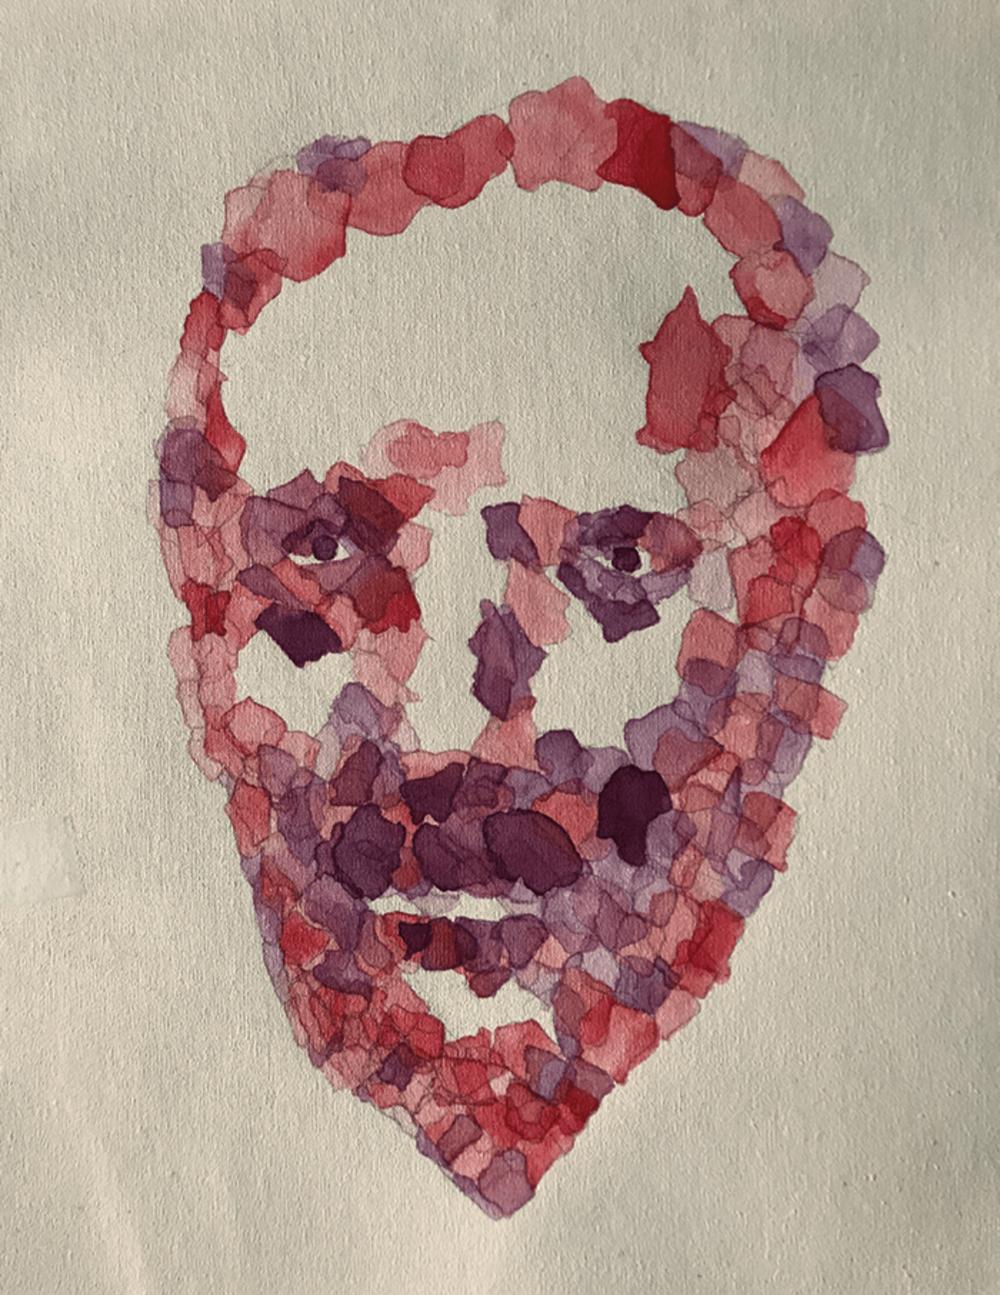 Portraits of Pathology